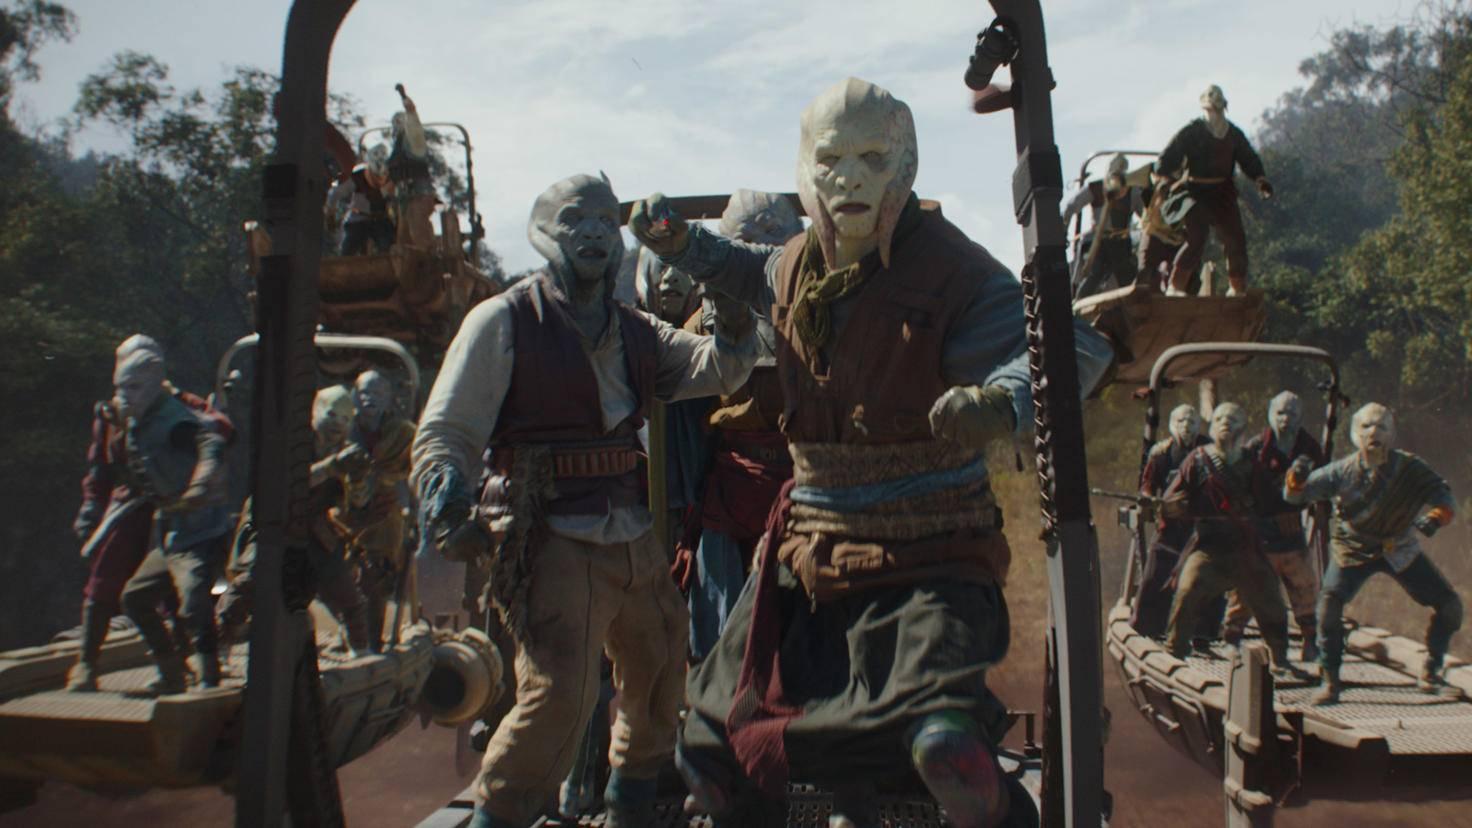 Mandalorian S02E07 Piraten